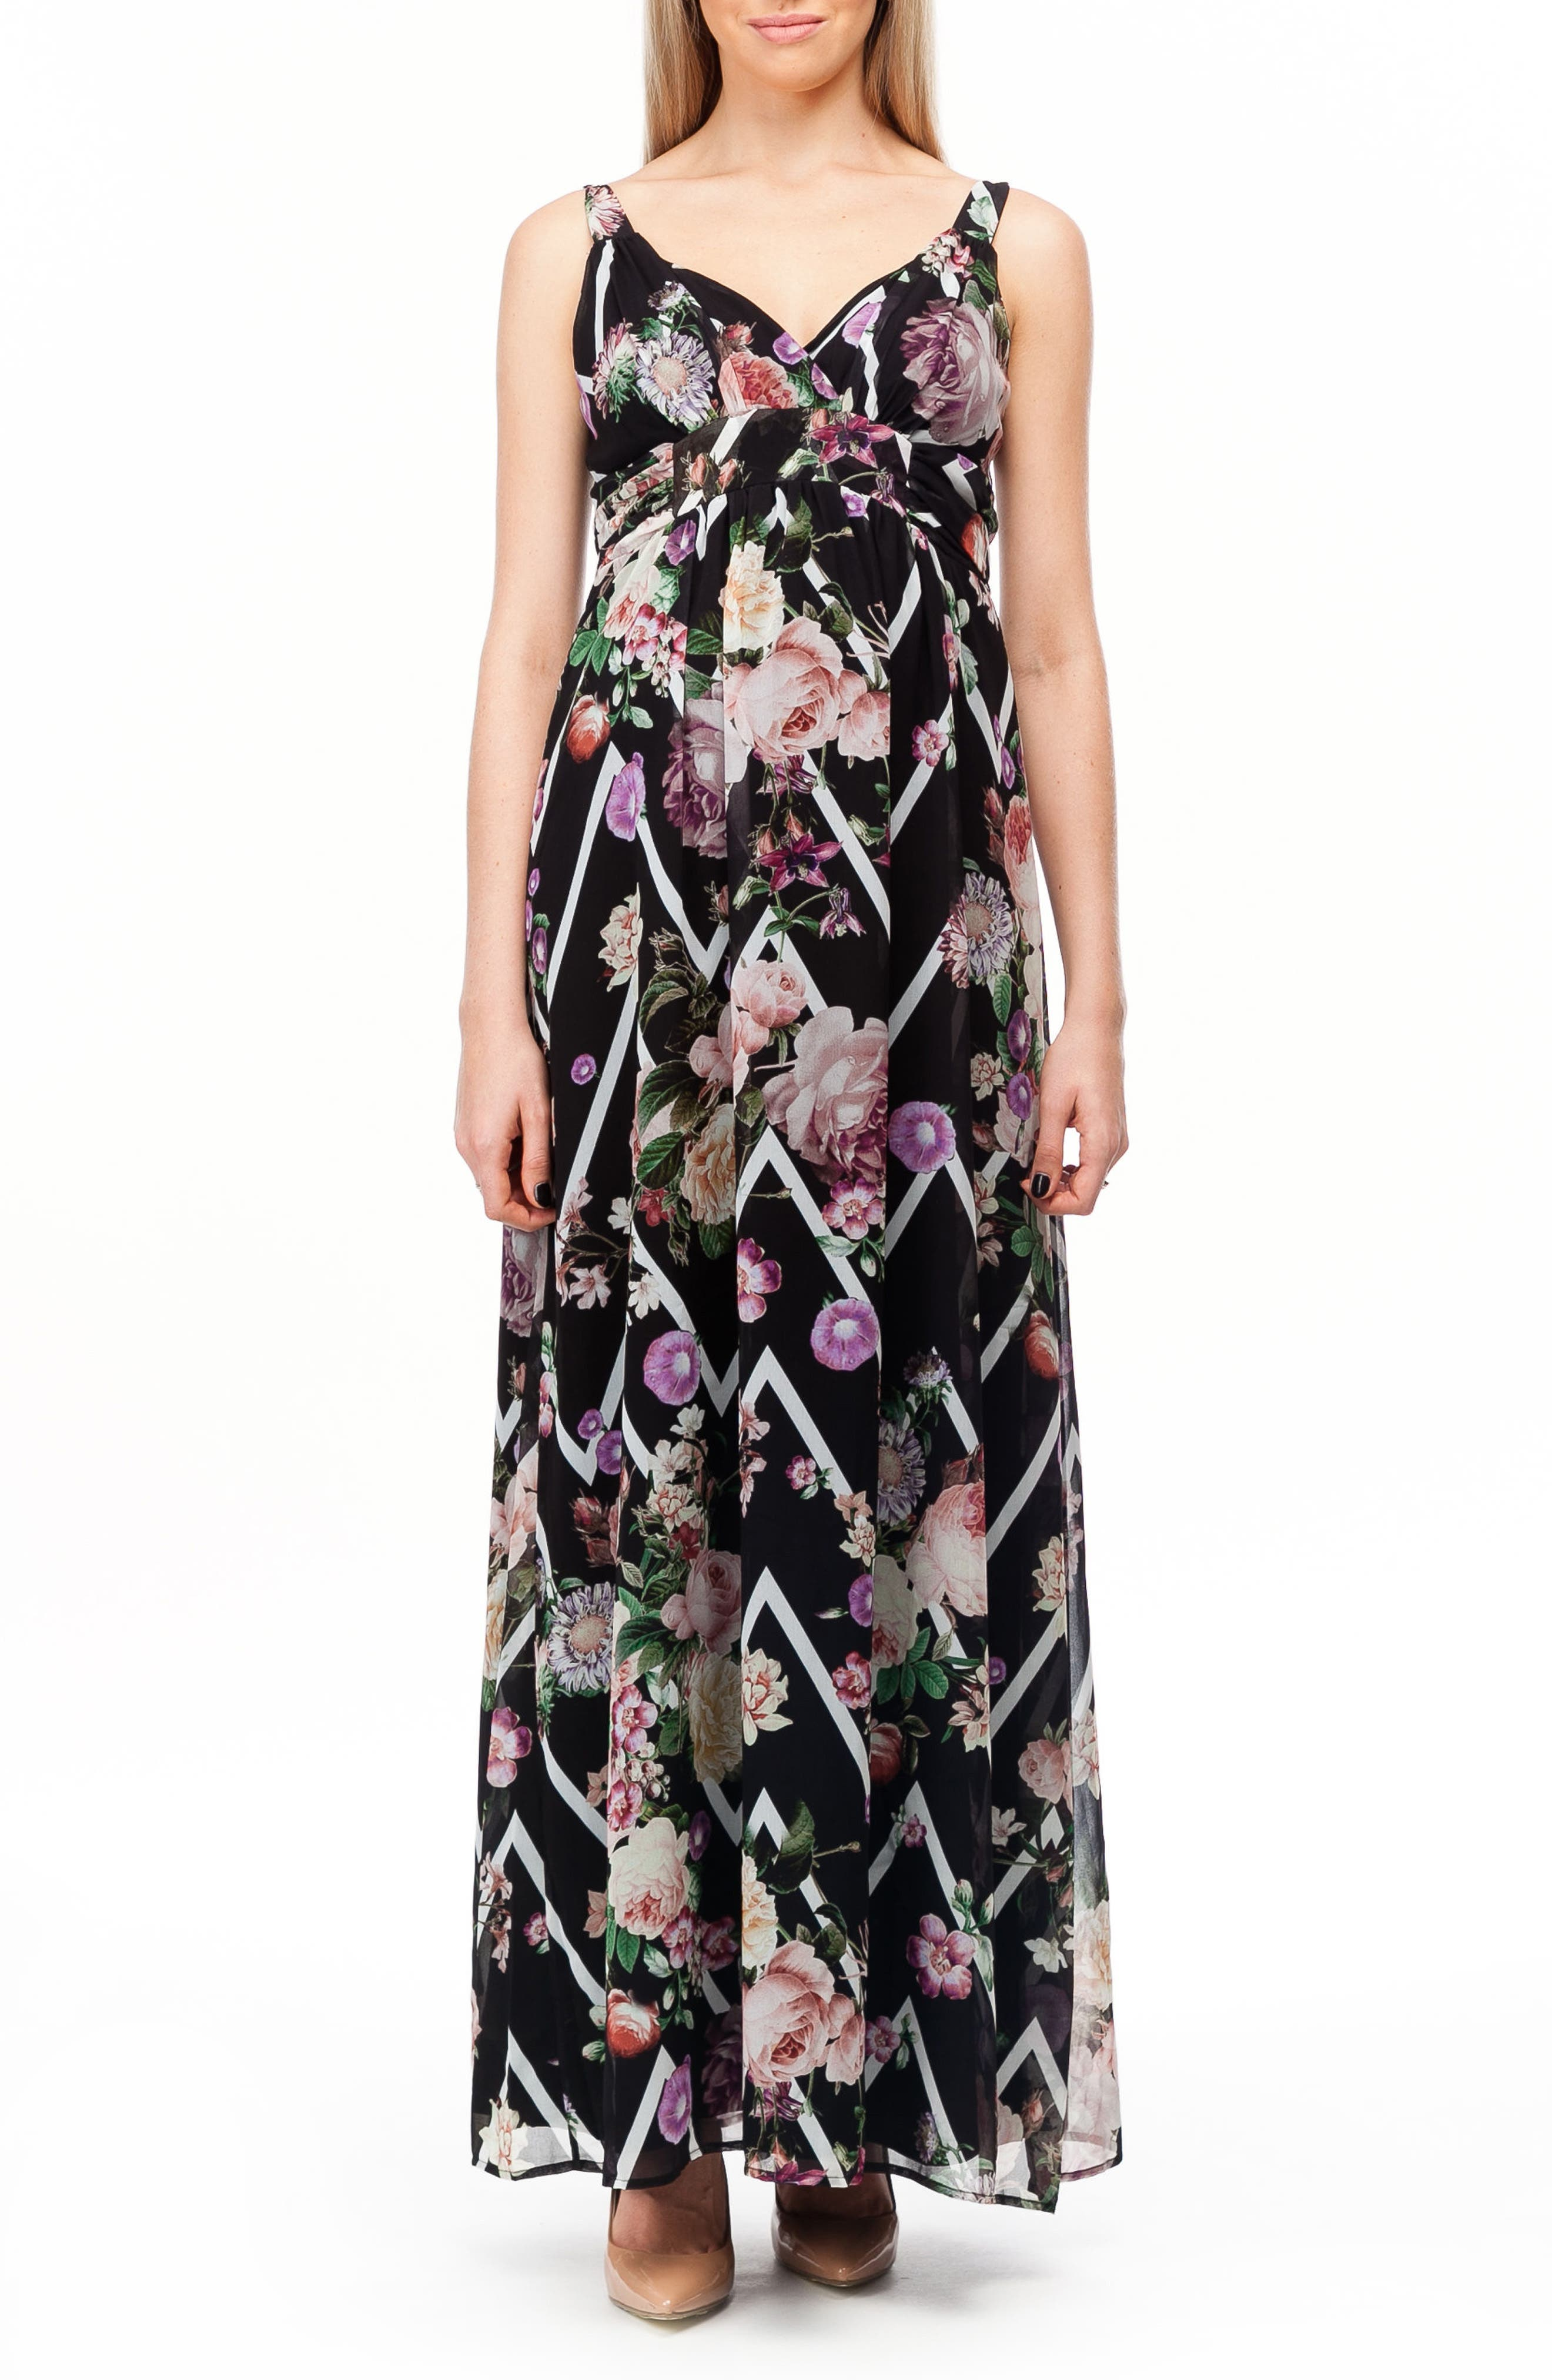 Murano Maternity Maxi Dress,                             Alternate thumbnail 2, color,                             FLOWER ZIGZAG